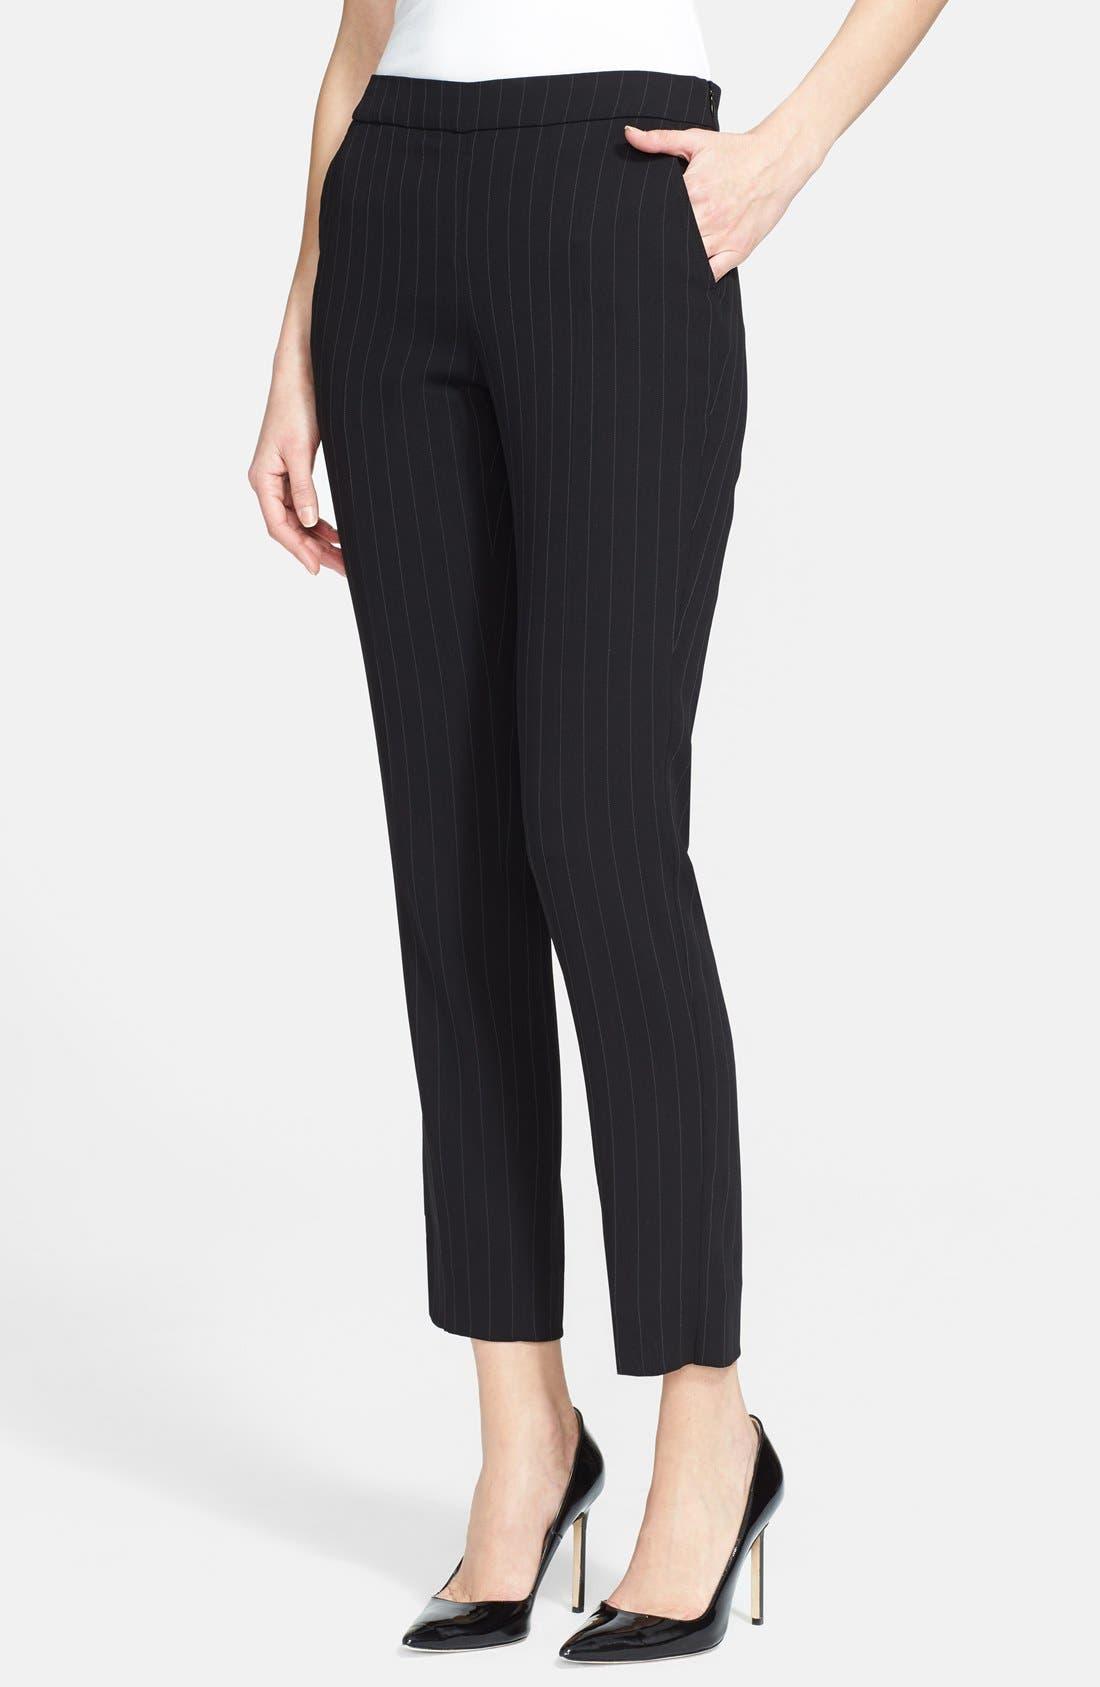 Alternate Image 1 Selected - Armani Collezioni Pinstripe Pants